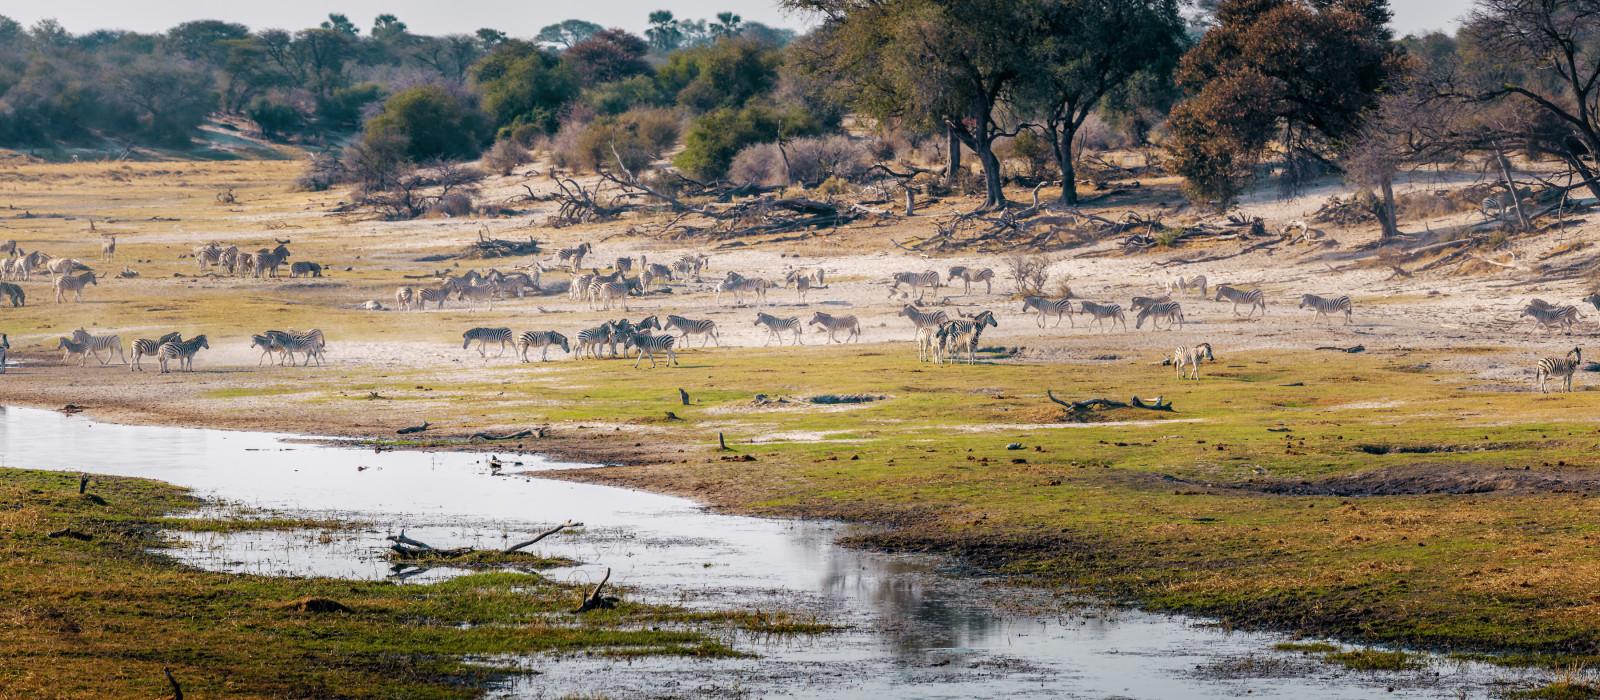 Boteti River, Makgadikgadi National Park, Botswana, Africa